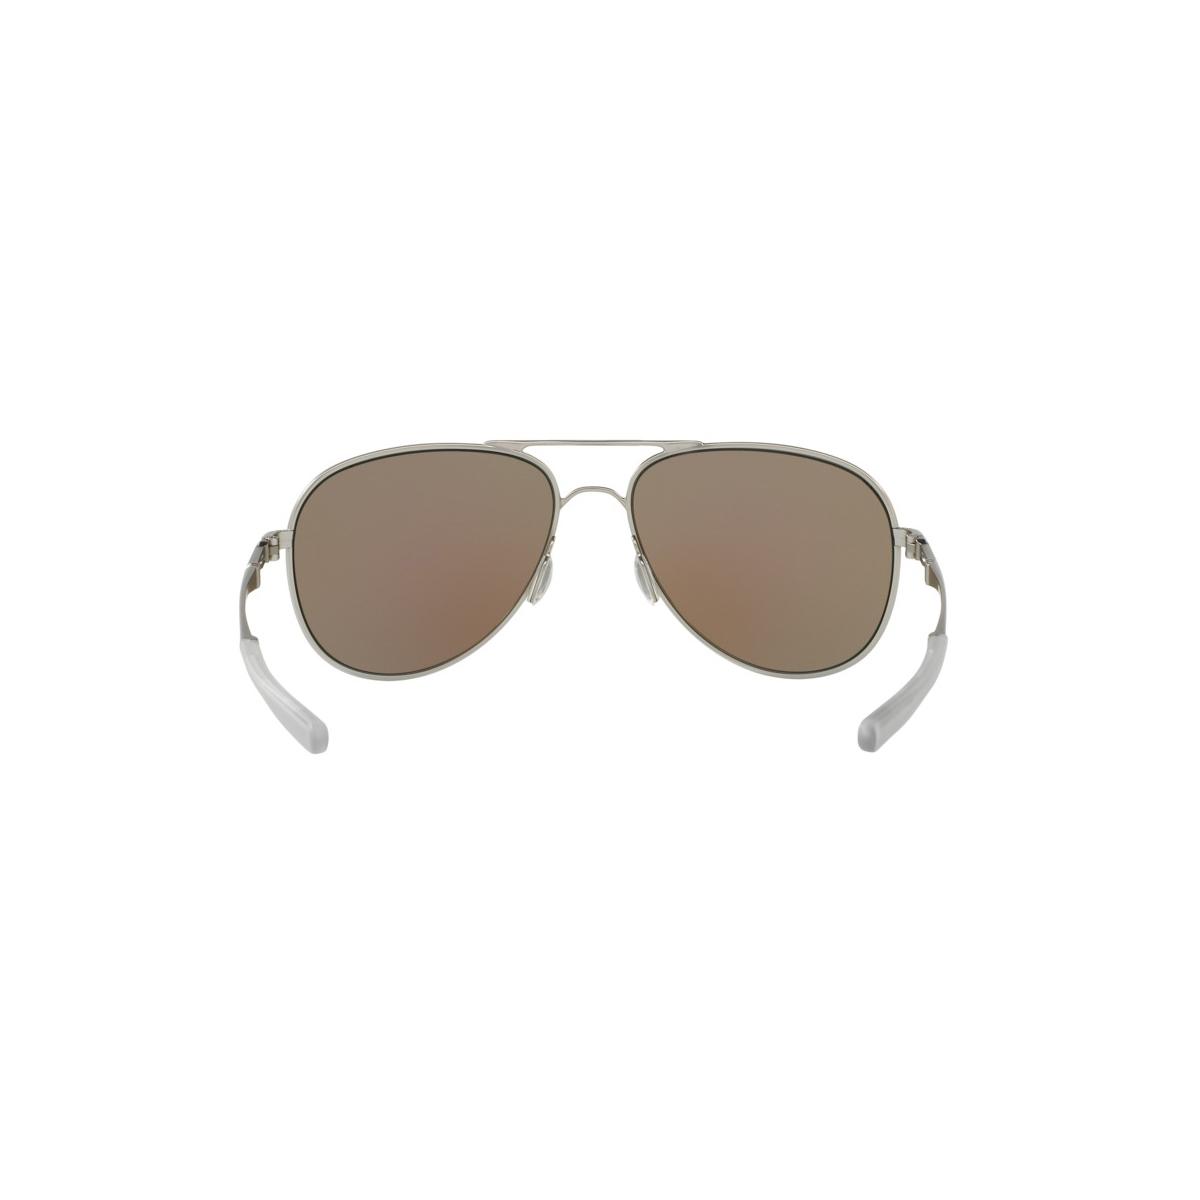 ... Óculos Oakley Elmont L Satin Chrome  Lente Saphire Iridium Polarizado  ... 9fce179952